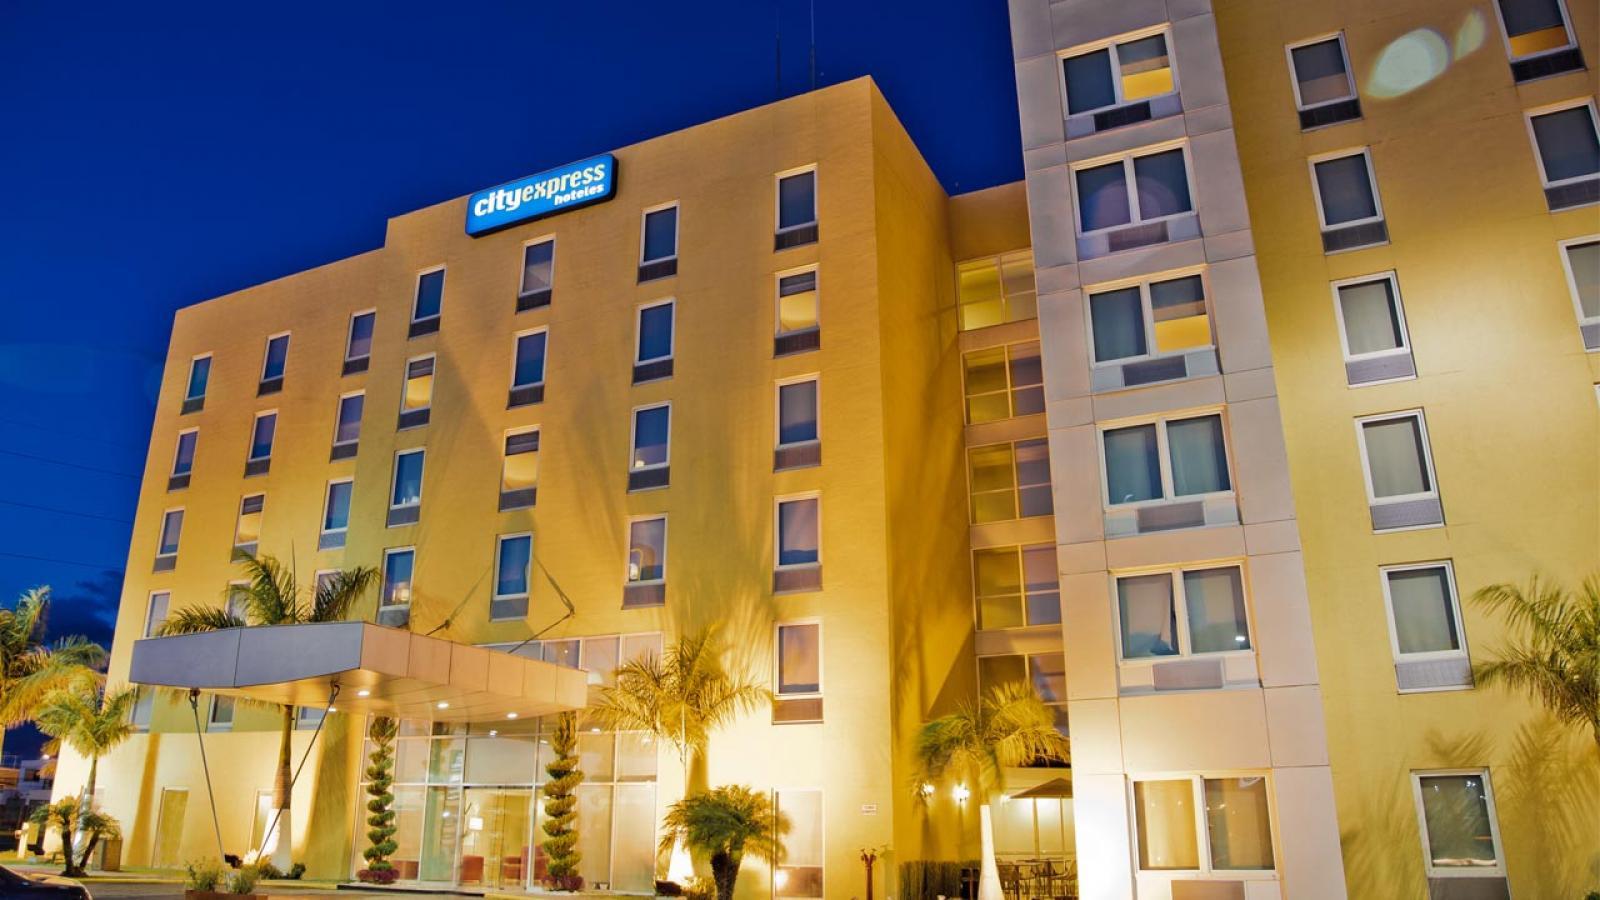 City Express Celaya Parque Hotels